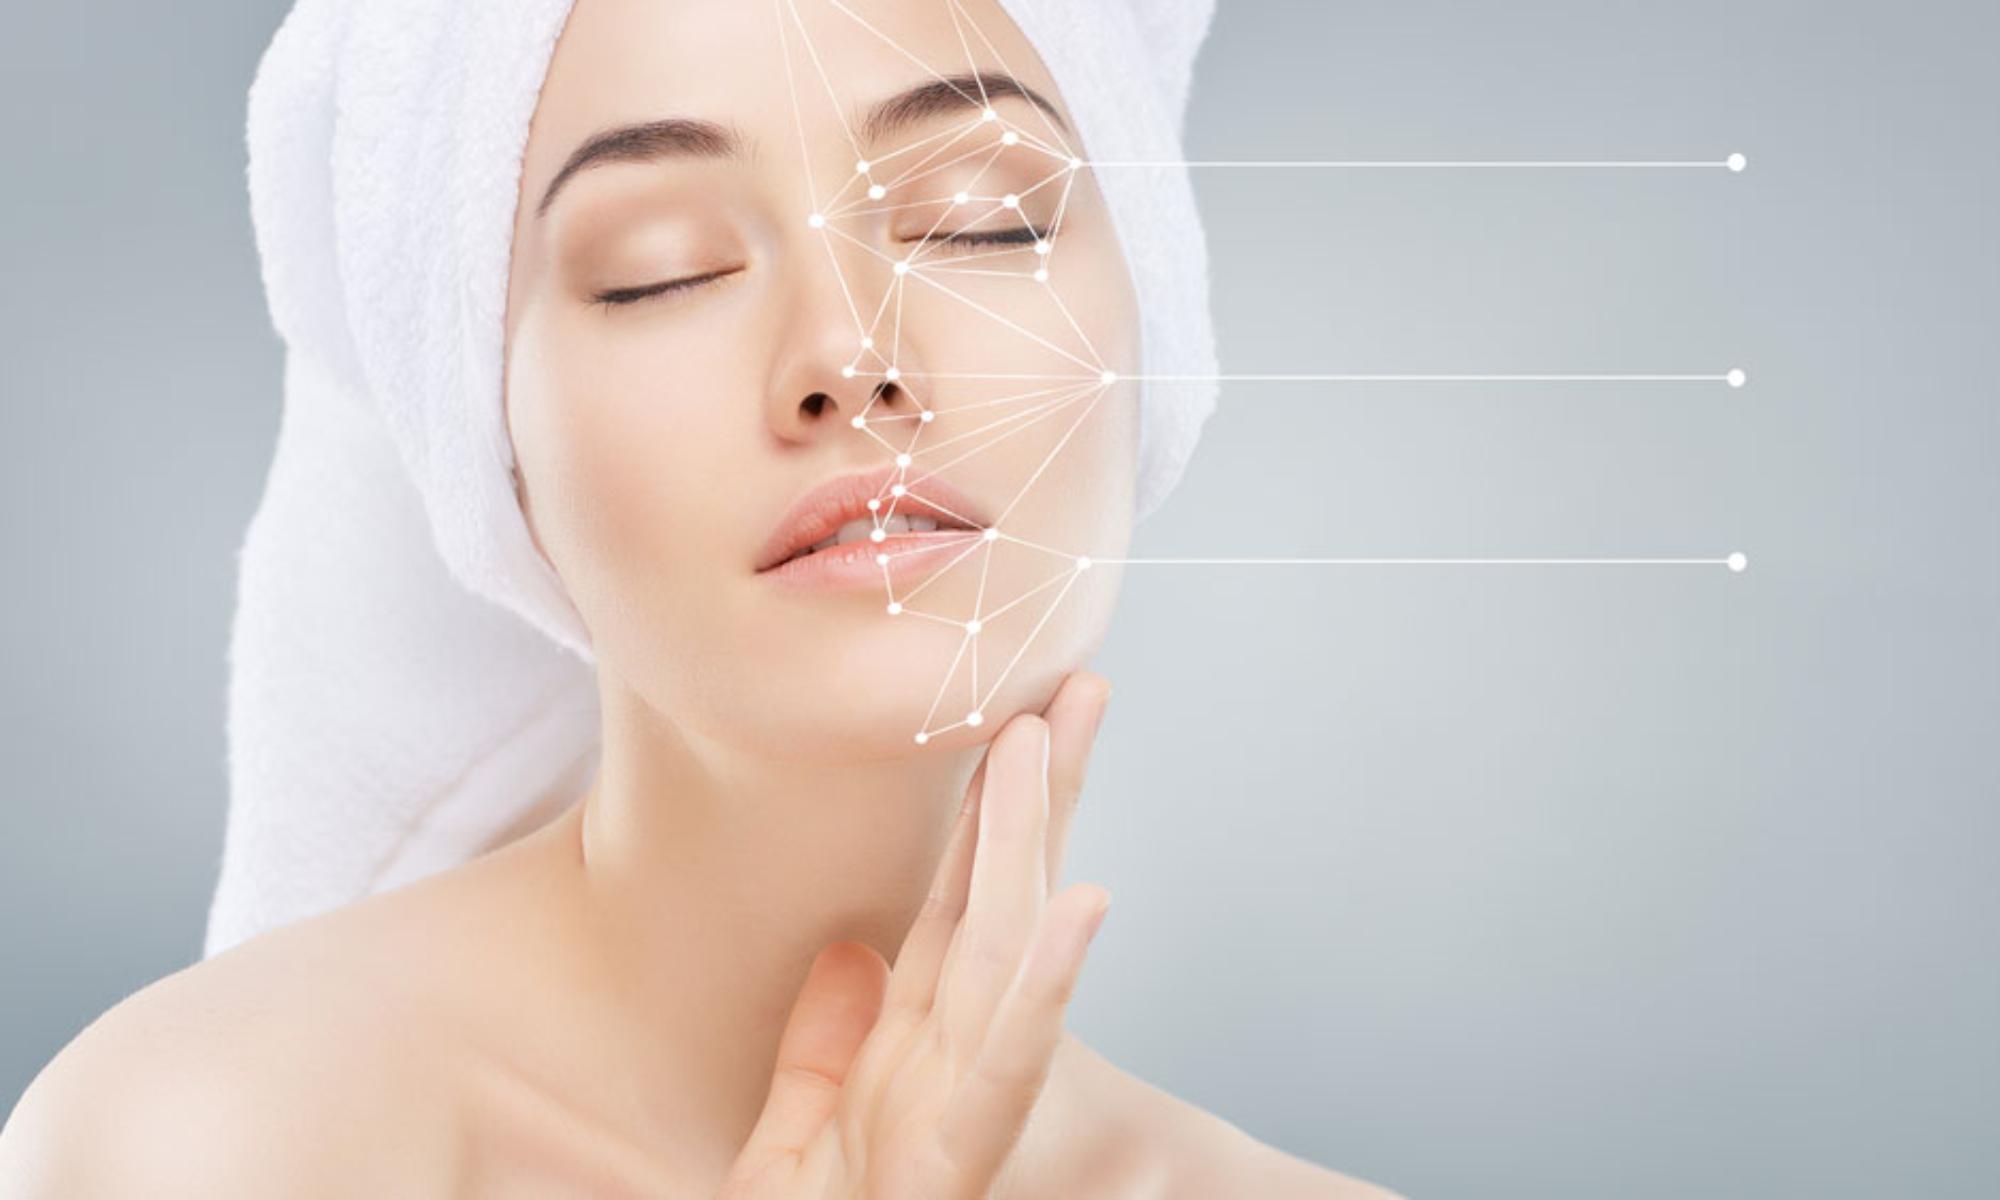 Dermatologia Friuli